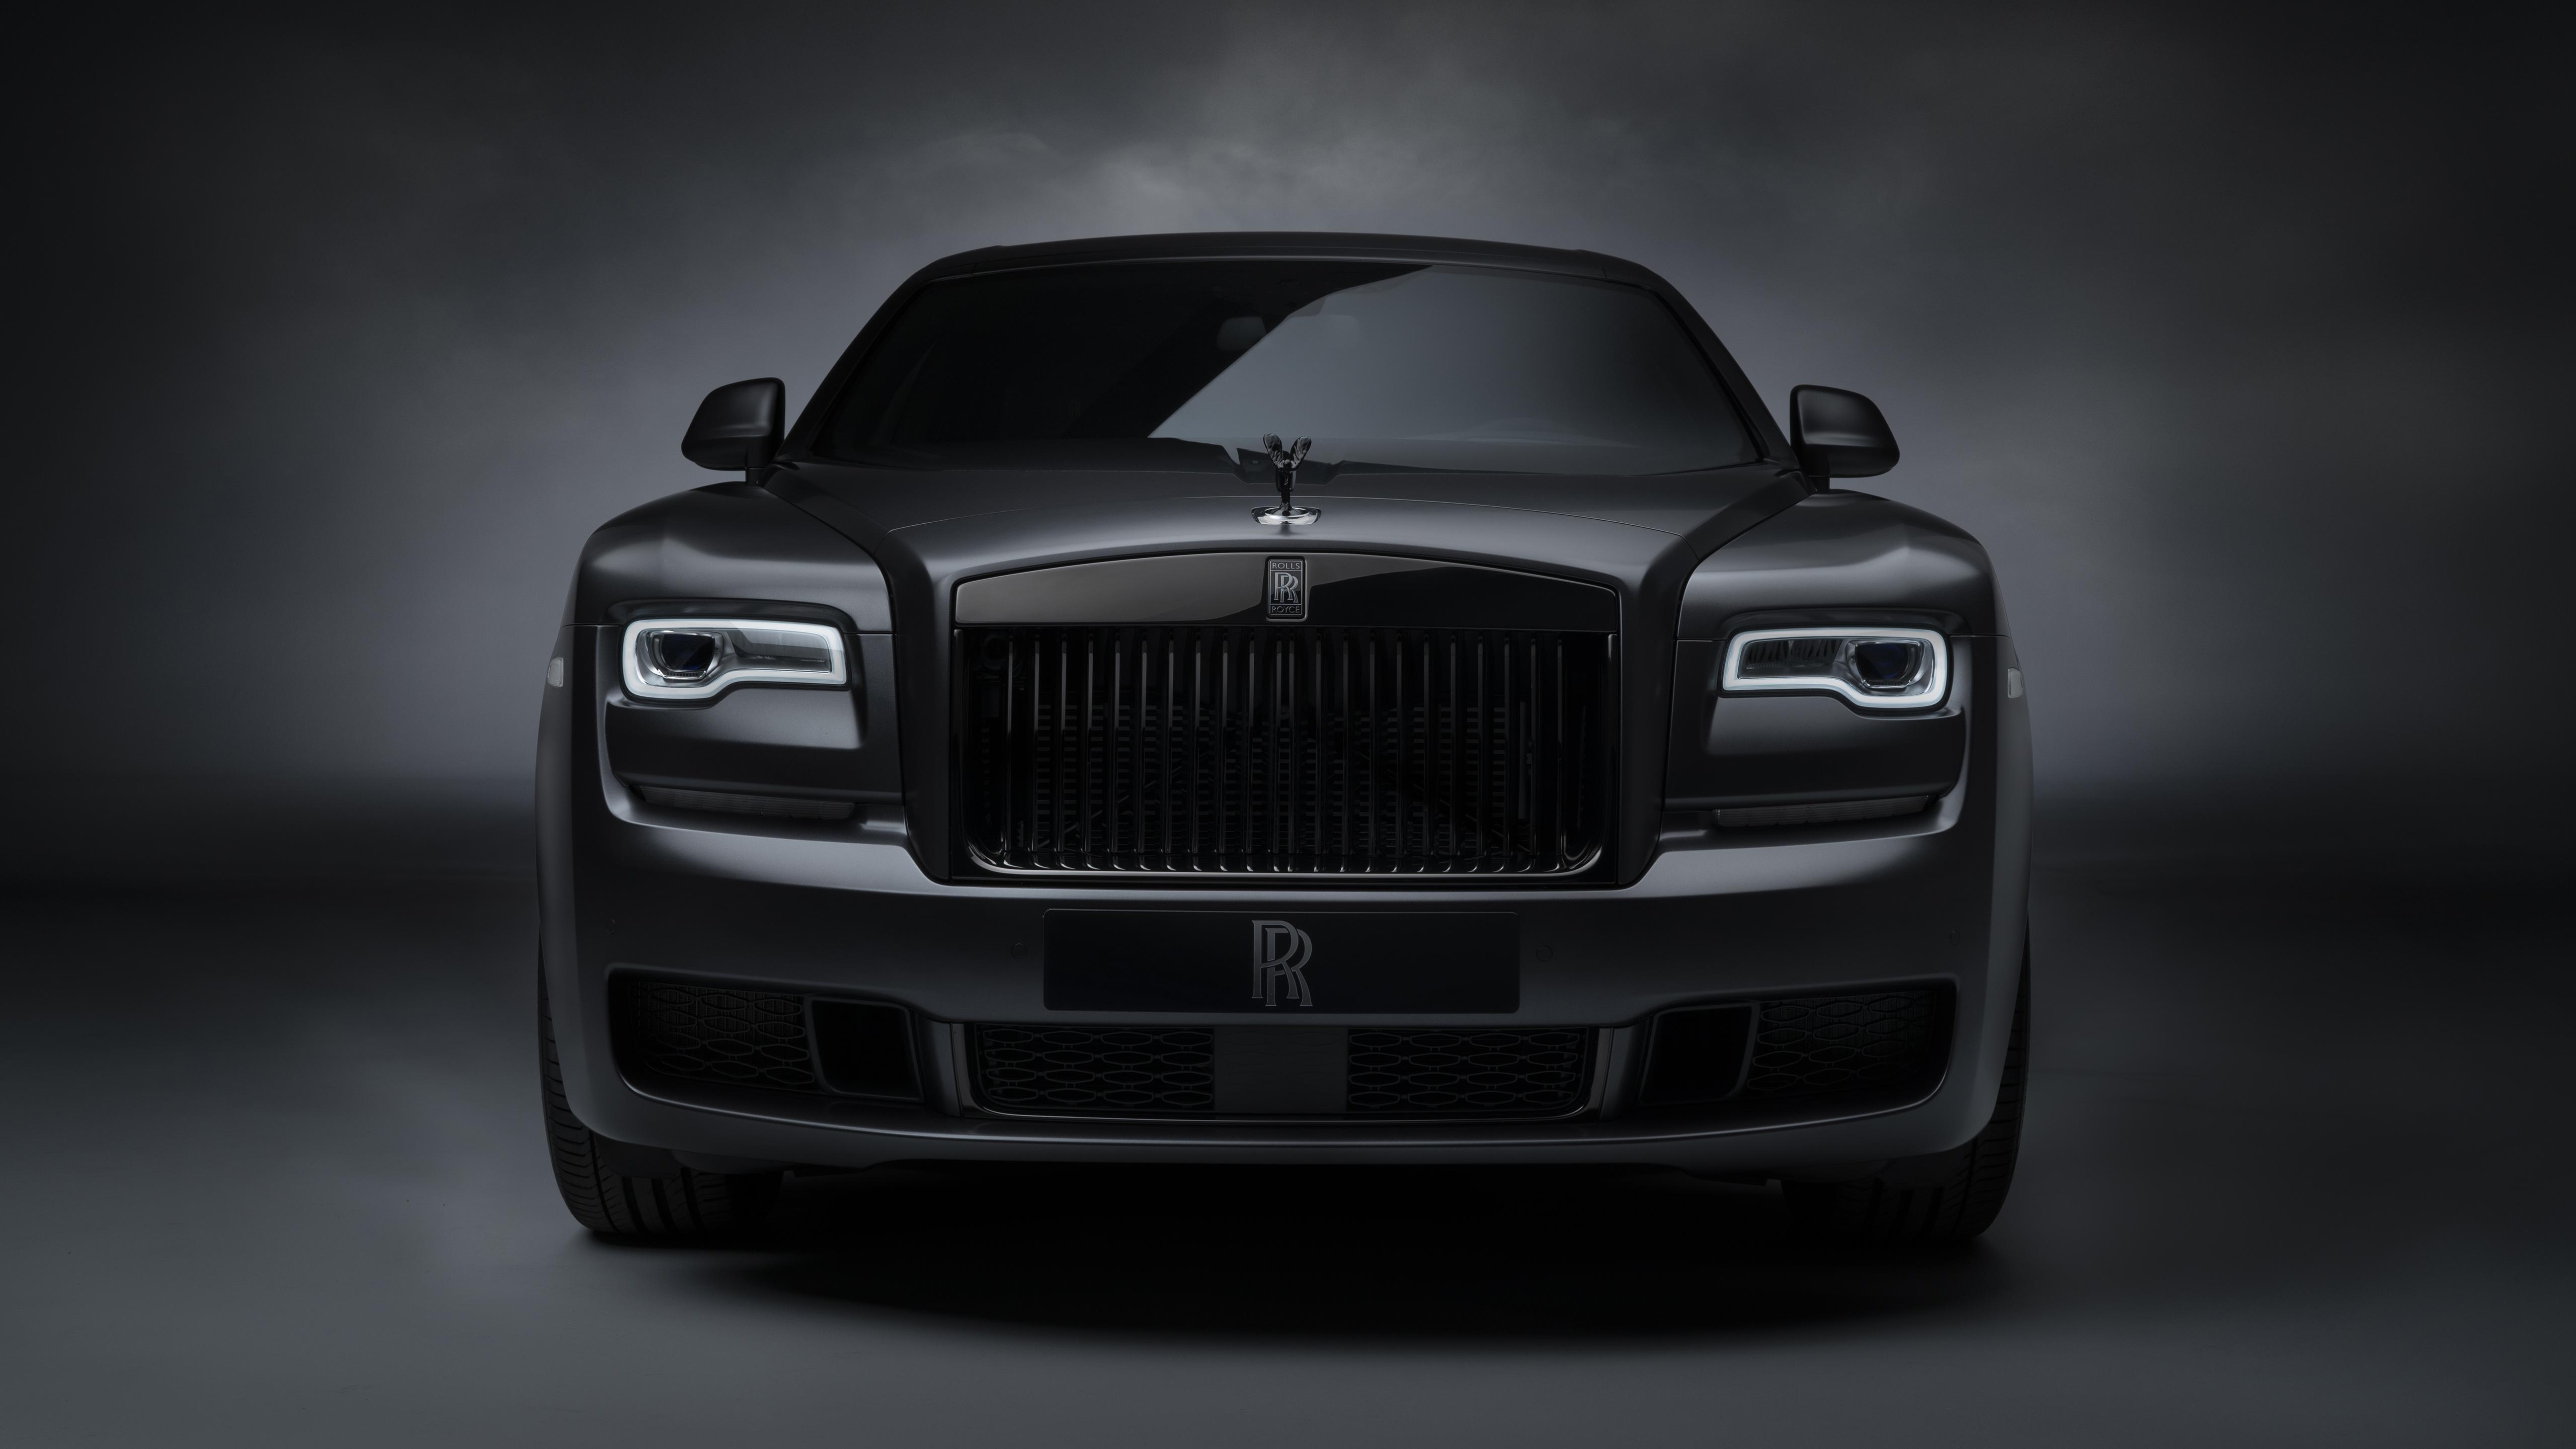 Rolls Royce Ghost Black Badge 2019 5k 2 Wallpaper Hd Car